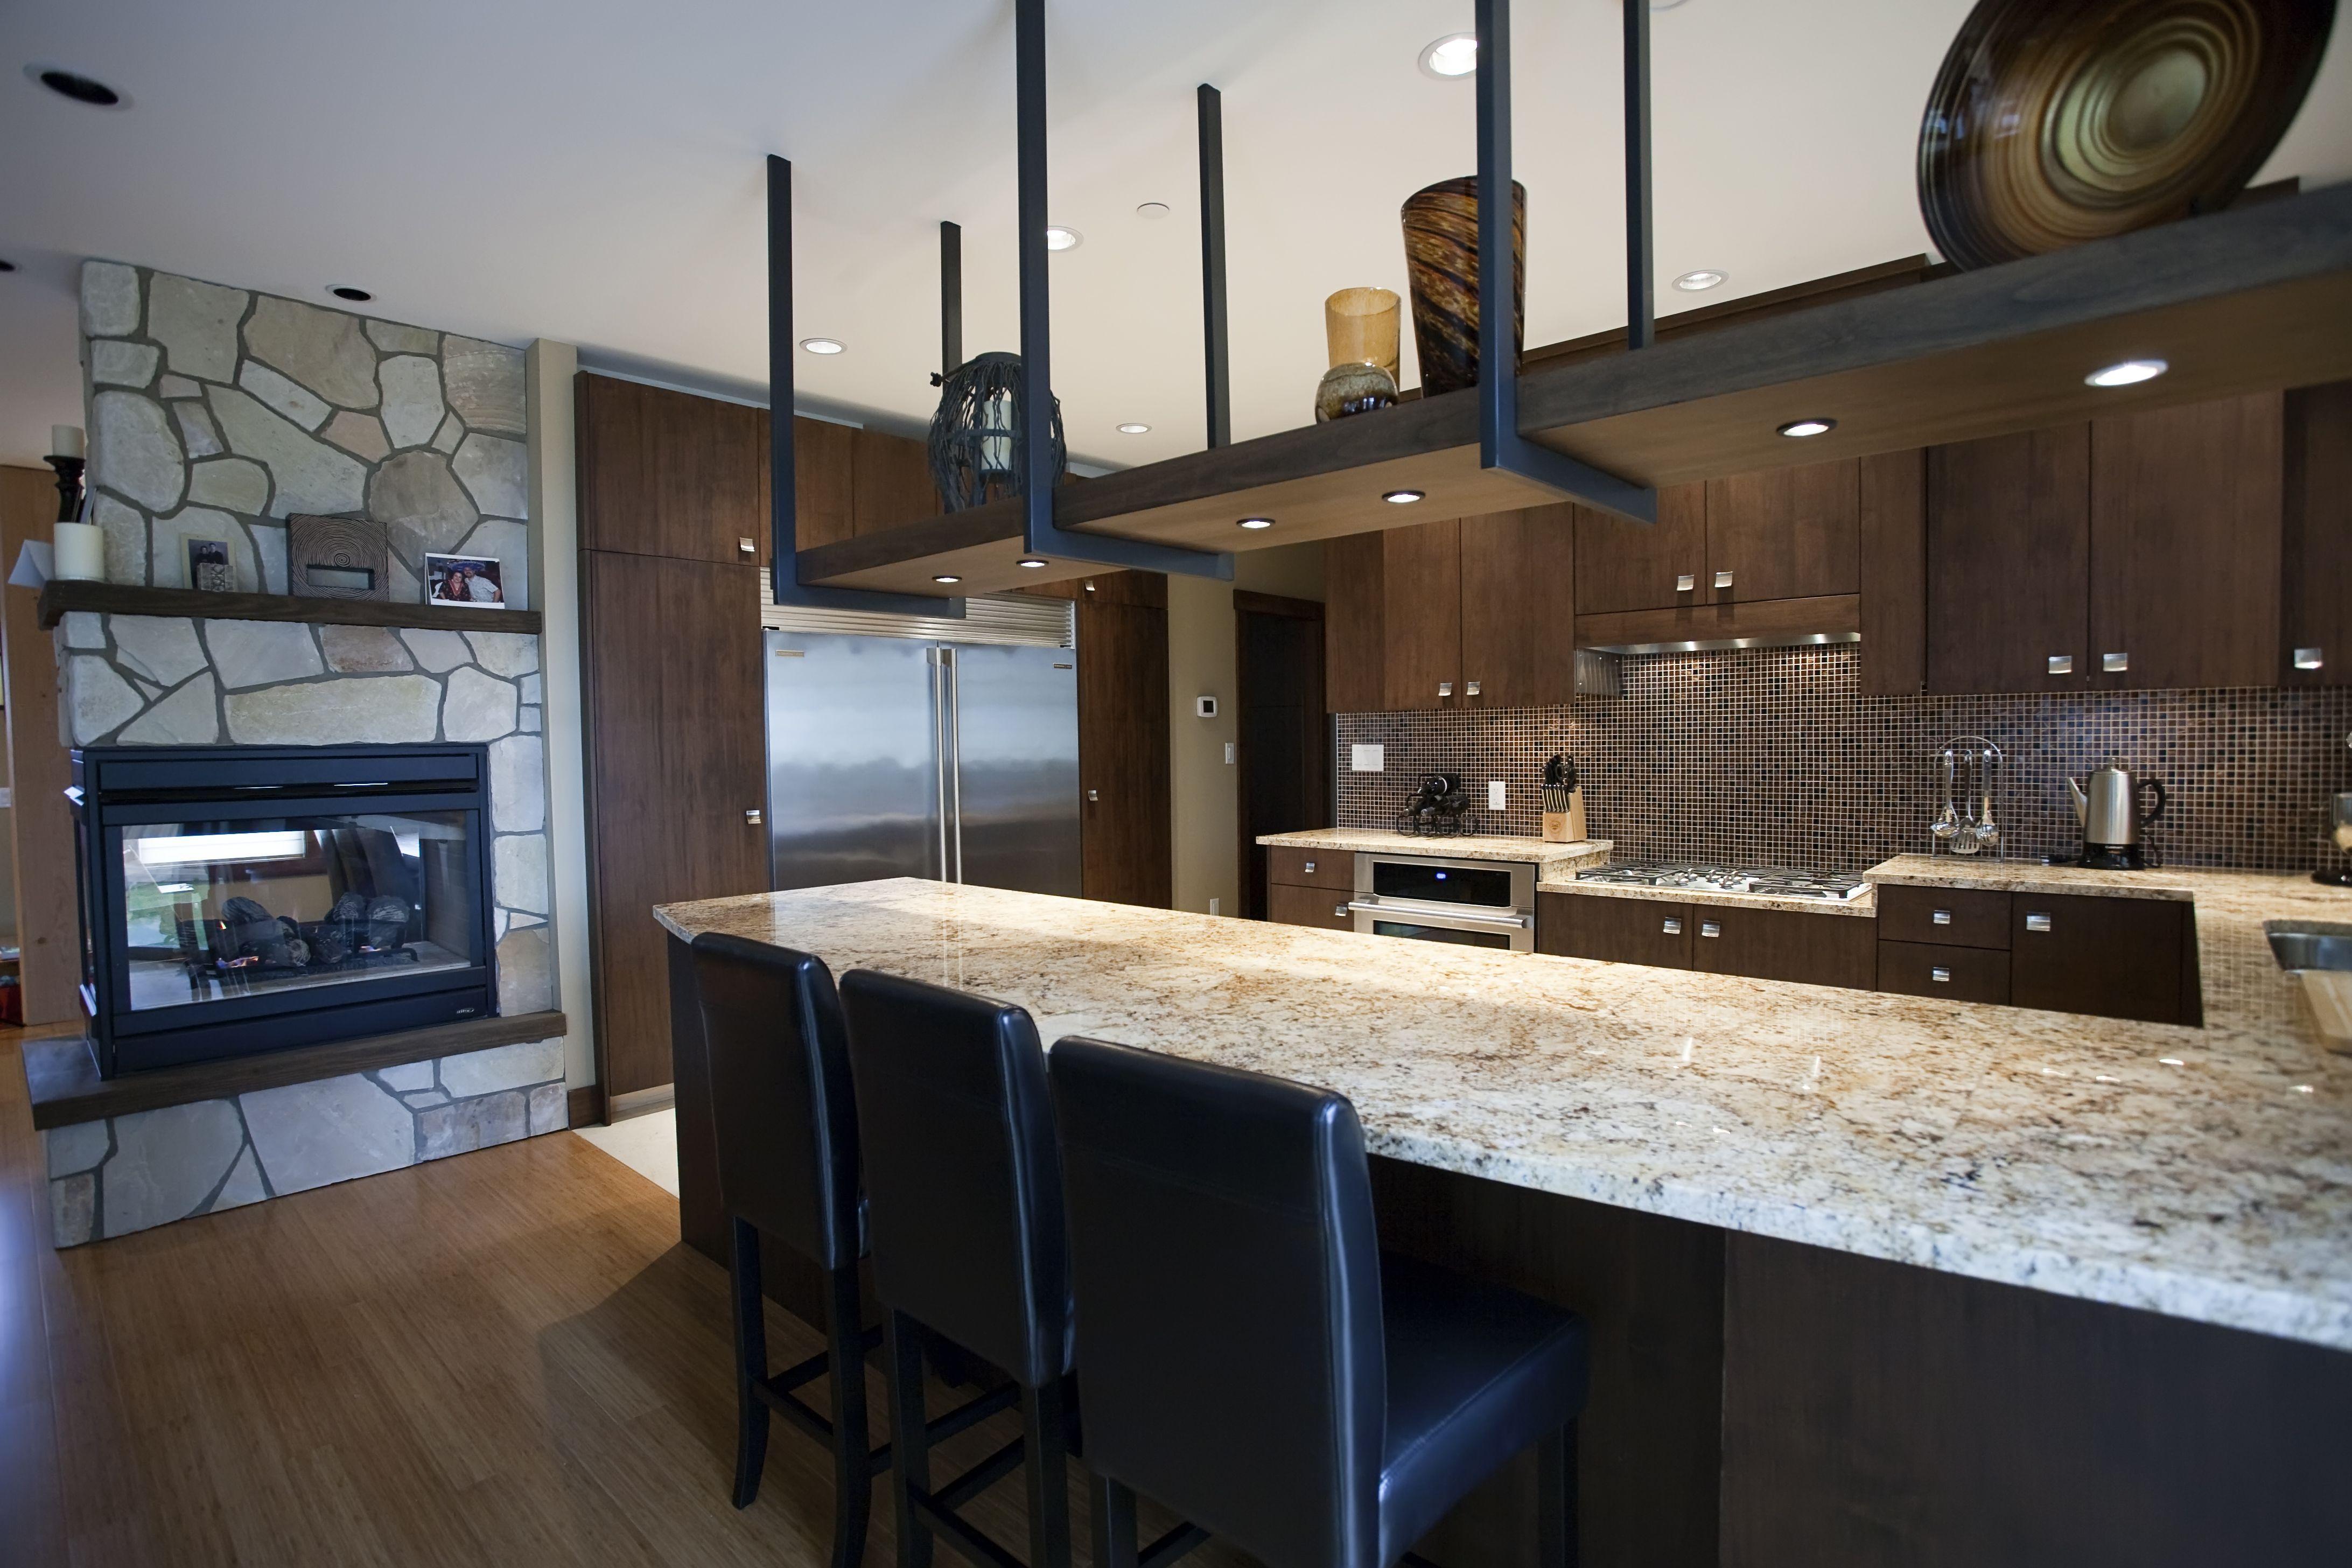 kitchen modern granite. Kitchen With Suspended Shelf - Large Curved Granite Breakfast Bar Electrolux Appliances Modern G